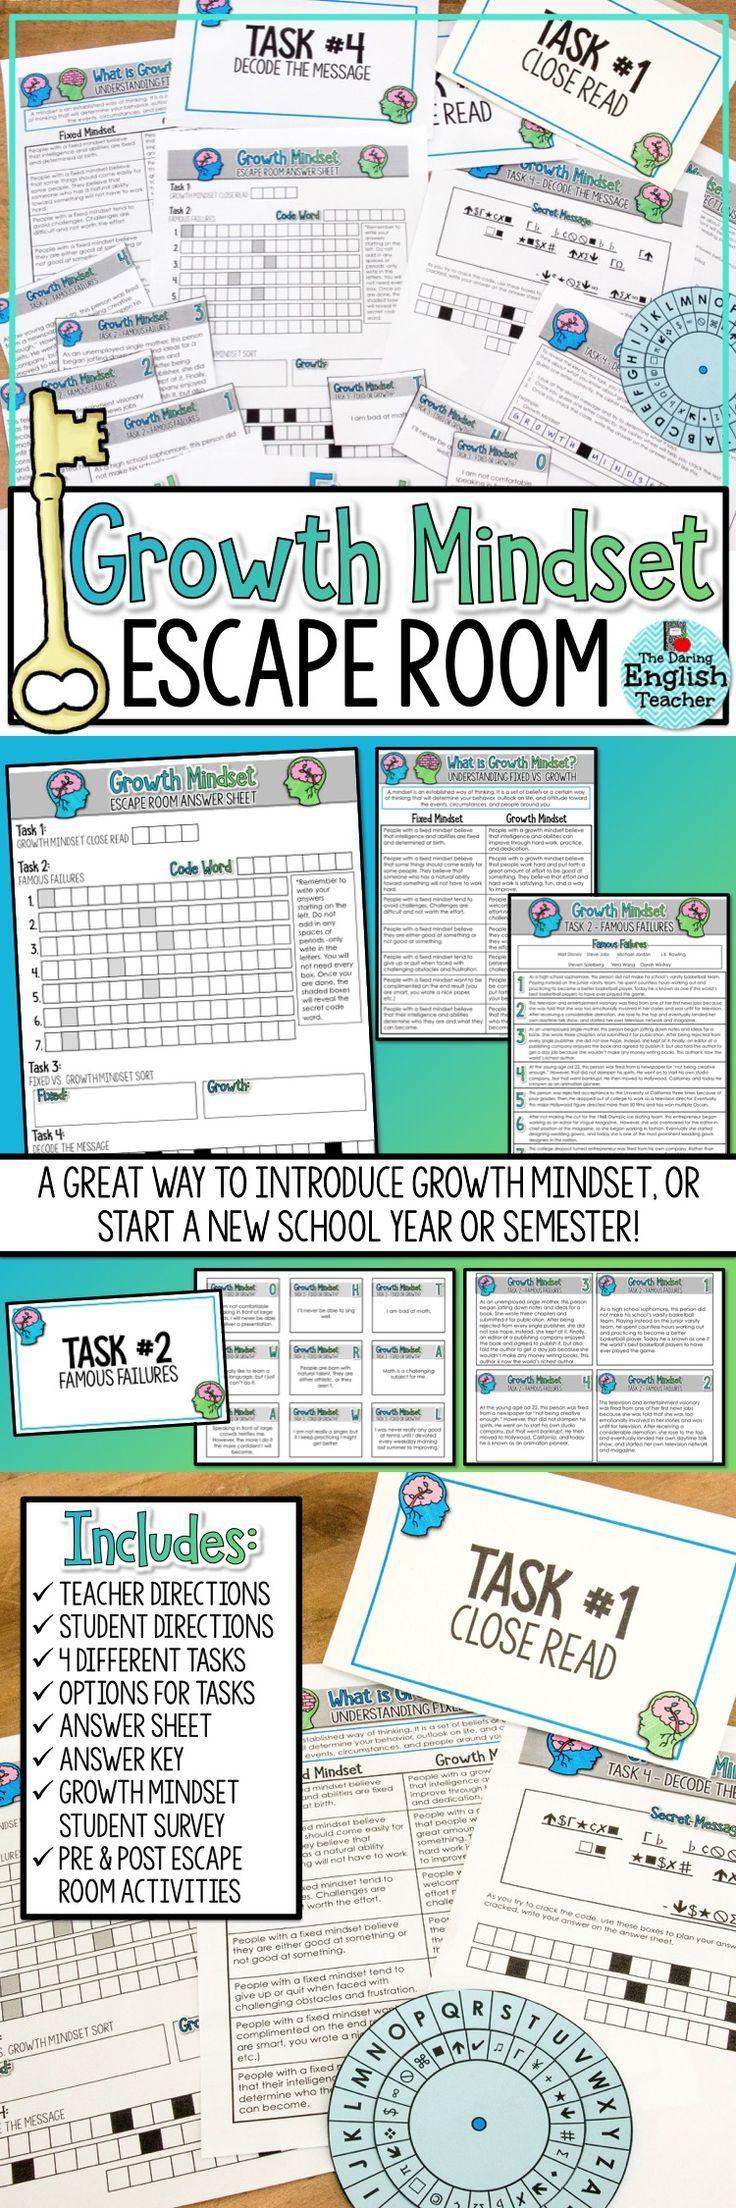 425 best Teacher Stuff :) images on Pinterest | School, Classroom ...